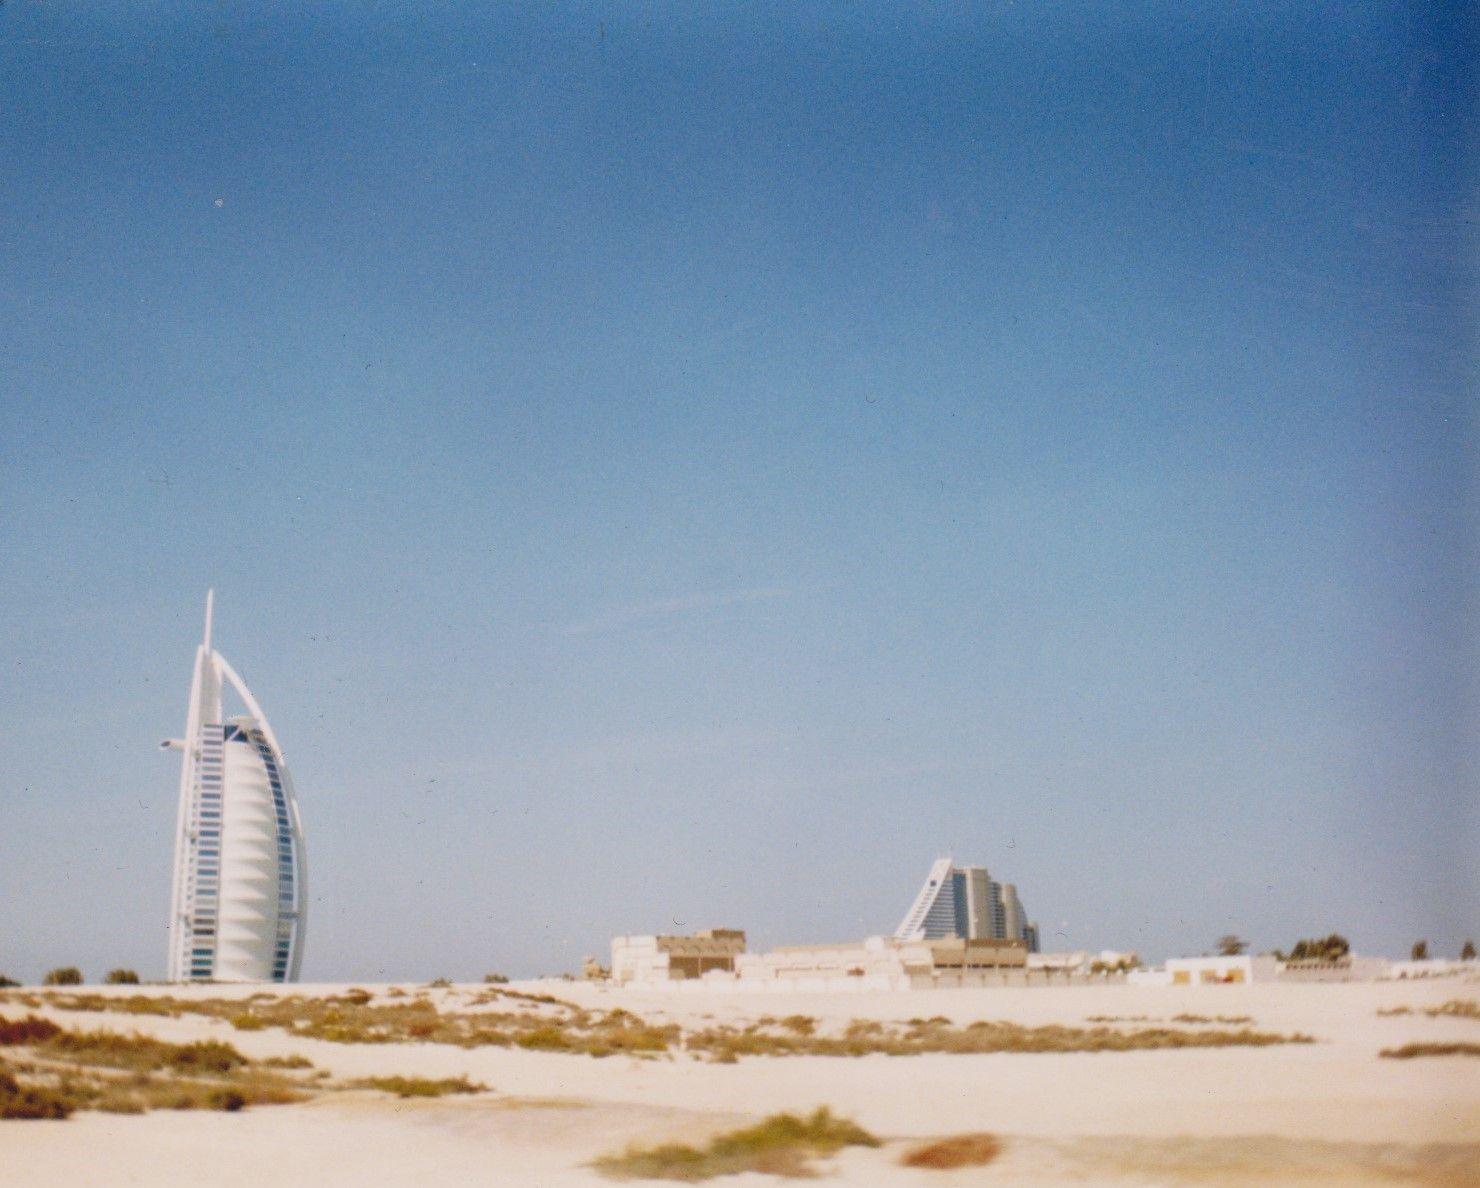 Barj Al Arab Dubai 2000 Dubai Middle East Landmarks